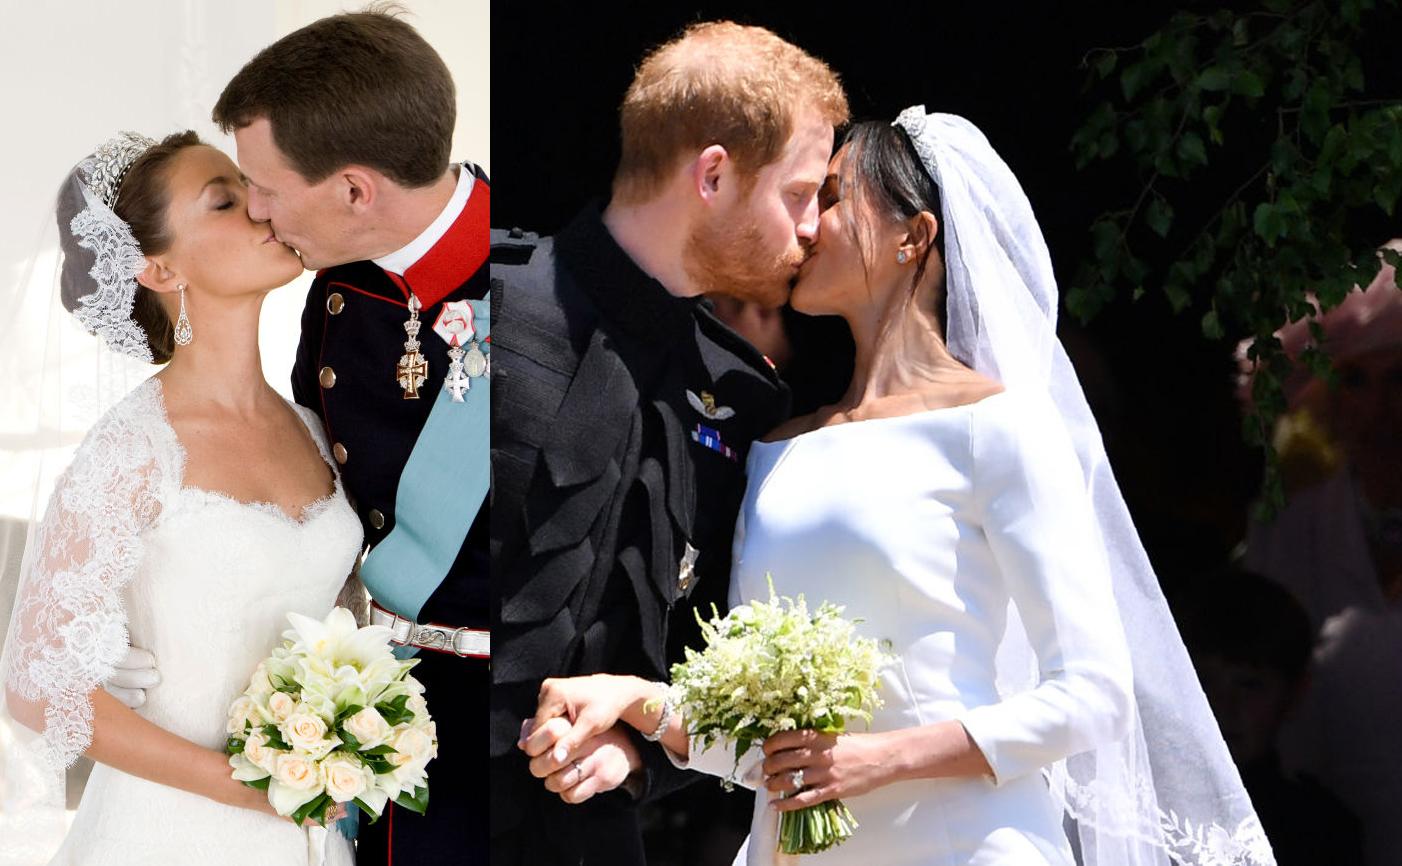 princesa Marie de Dinamarca príncipe Joaquín de Dinamarca príncipe Harry Meghan Markle wedding compose